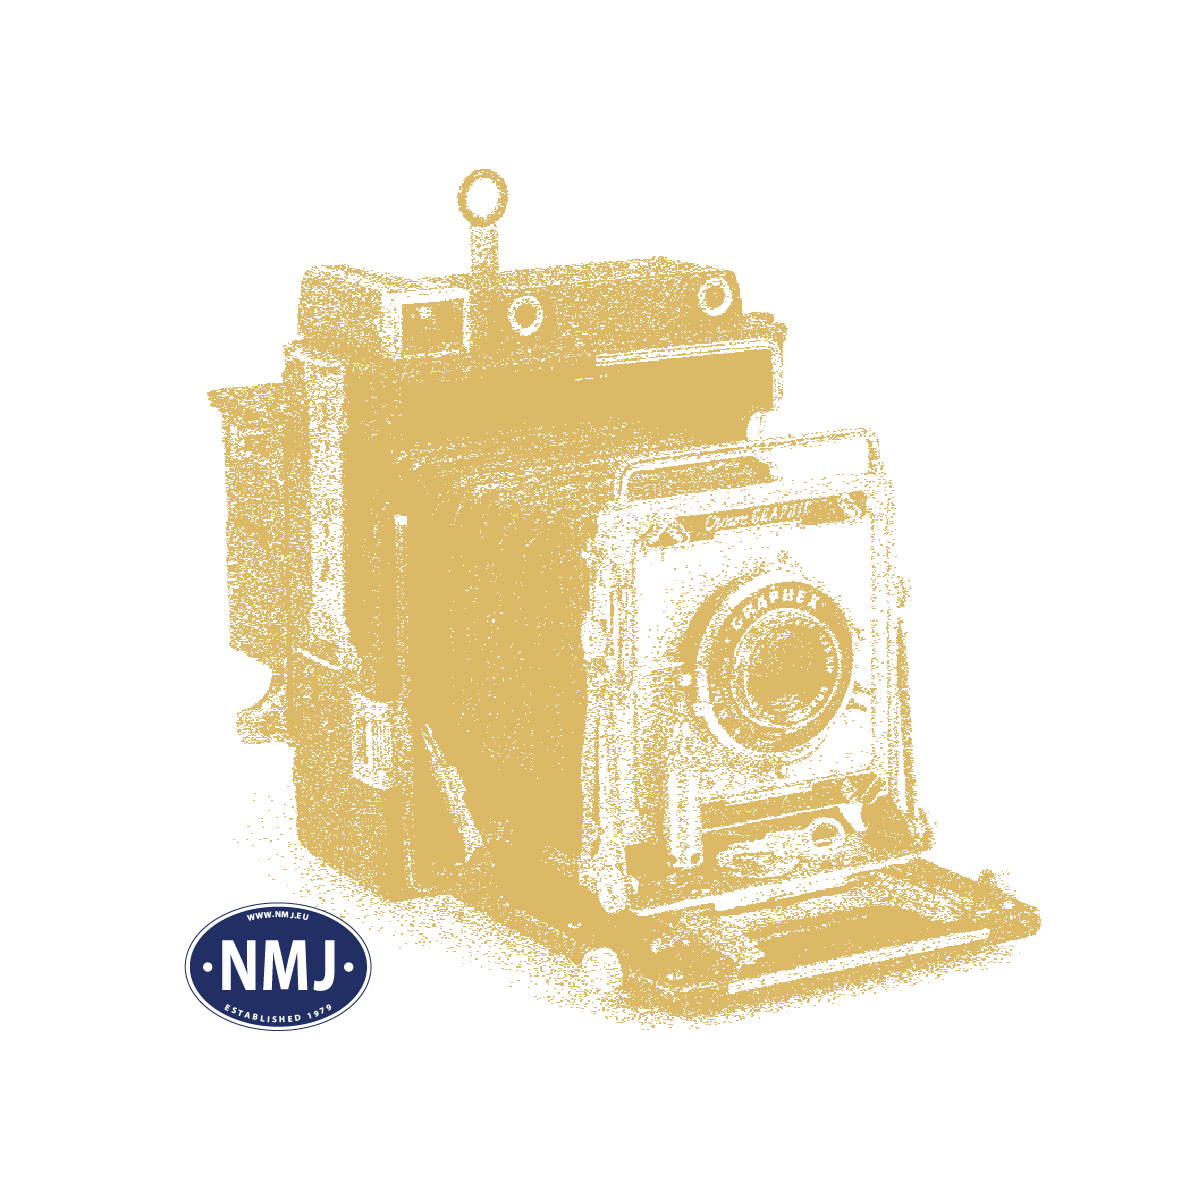 NMJT80.102AC - NMJ Topline NSB EL17.2222, AC, rotbraun